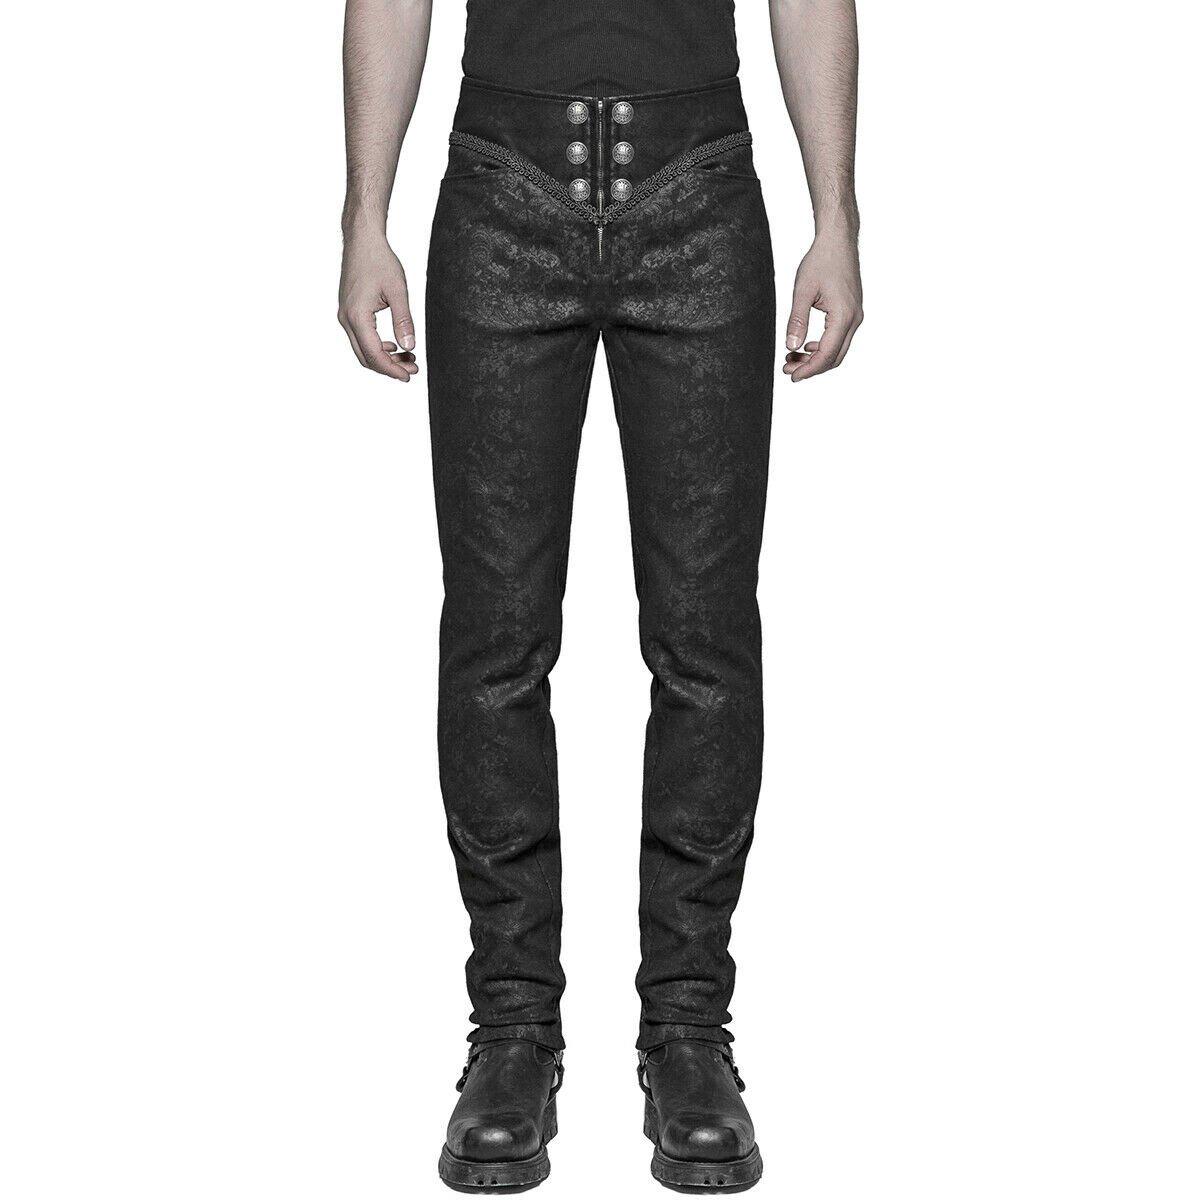 Black Brocade Pants